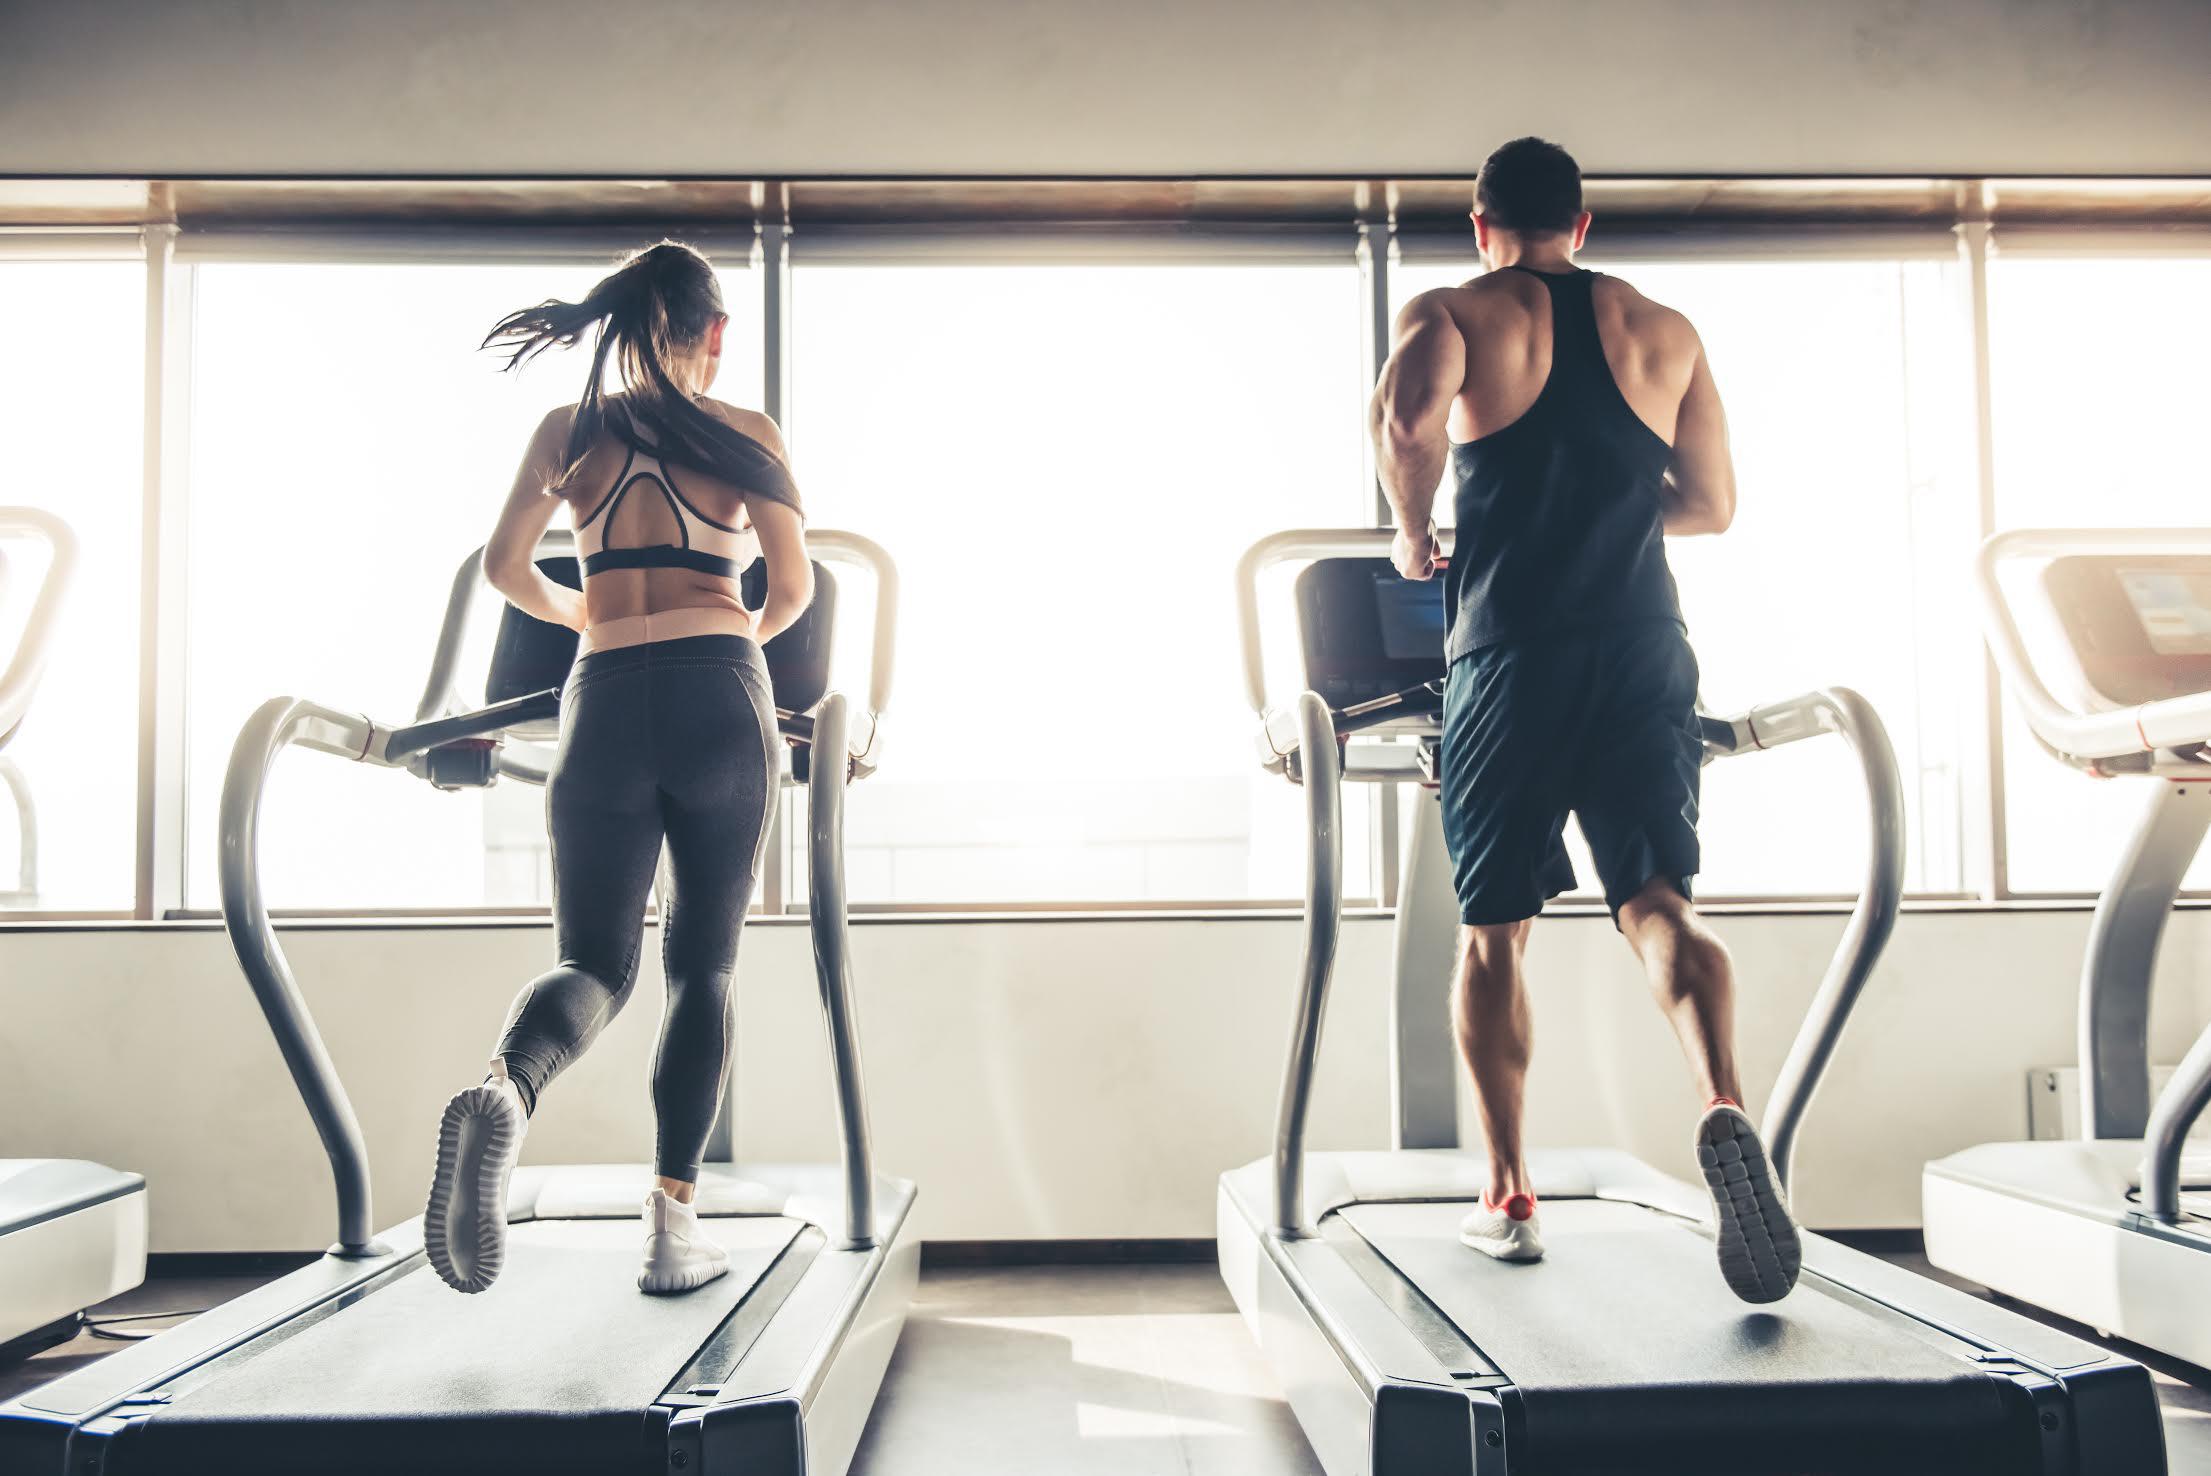 Athletic /Lifting Injury -